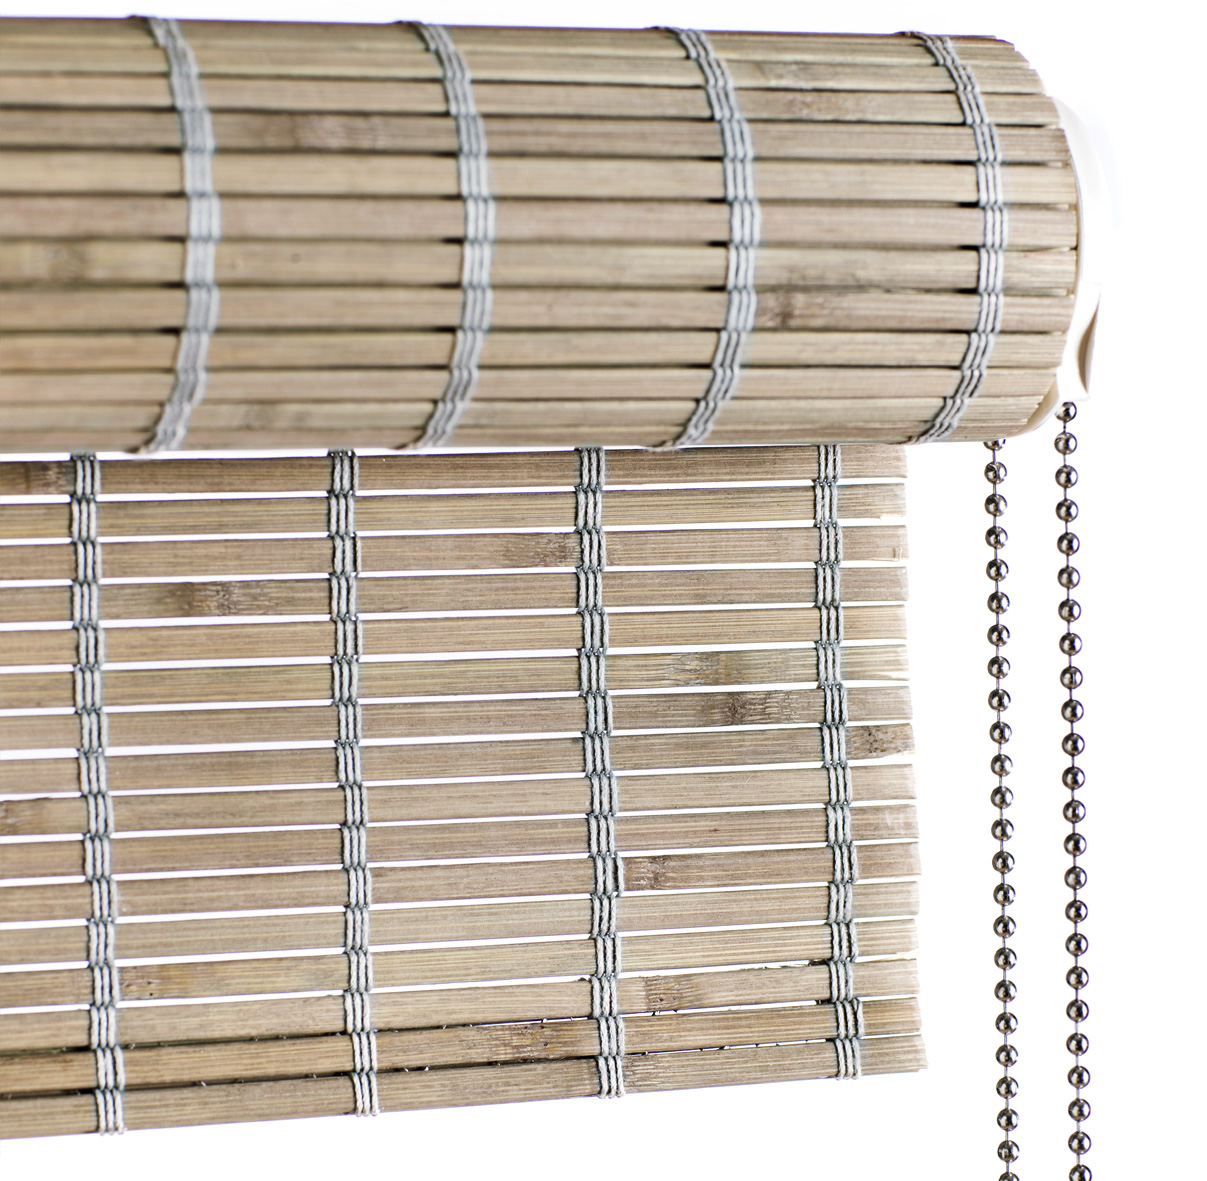 7eb43eb8 Gråt bambus rullegardin med kædetræk - Laves efter mål